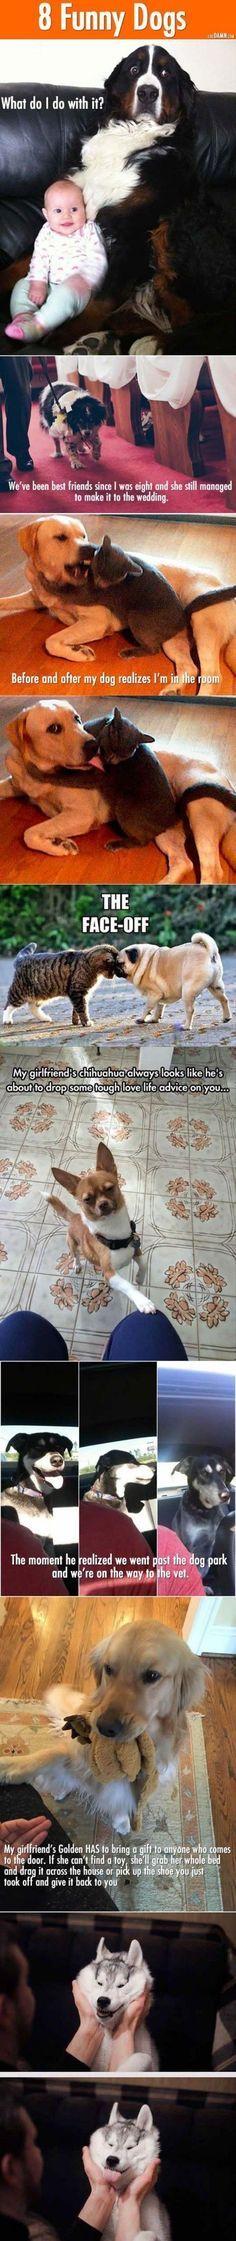 Die 22 perfektesten zeitgesteuerten Fotos des Jahres fotos jahres perfektesten zeitgesteuerten Funny Animal MemesFunny DogsFunny